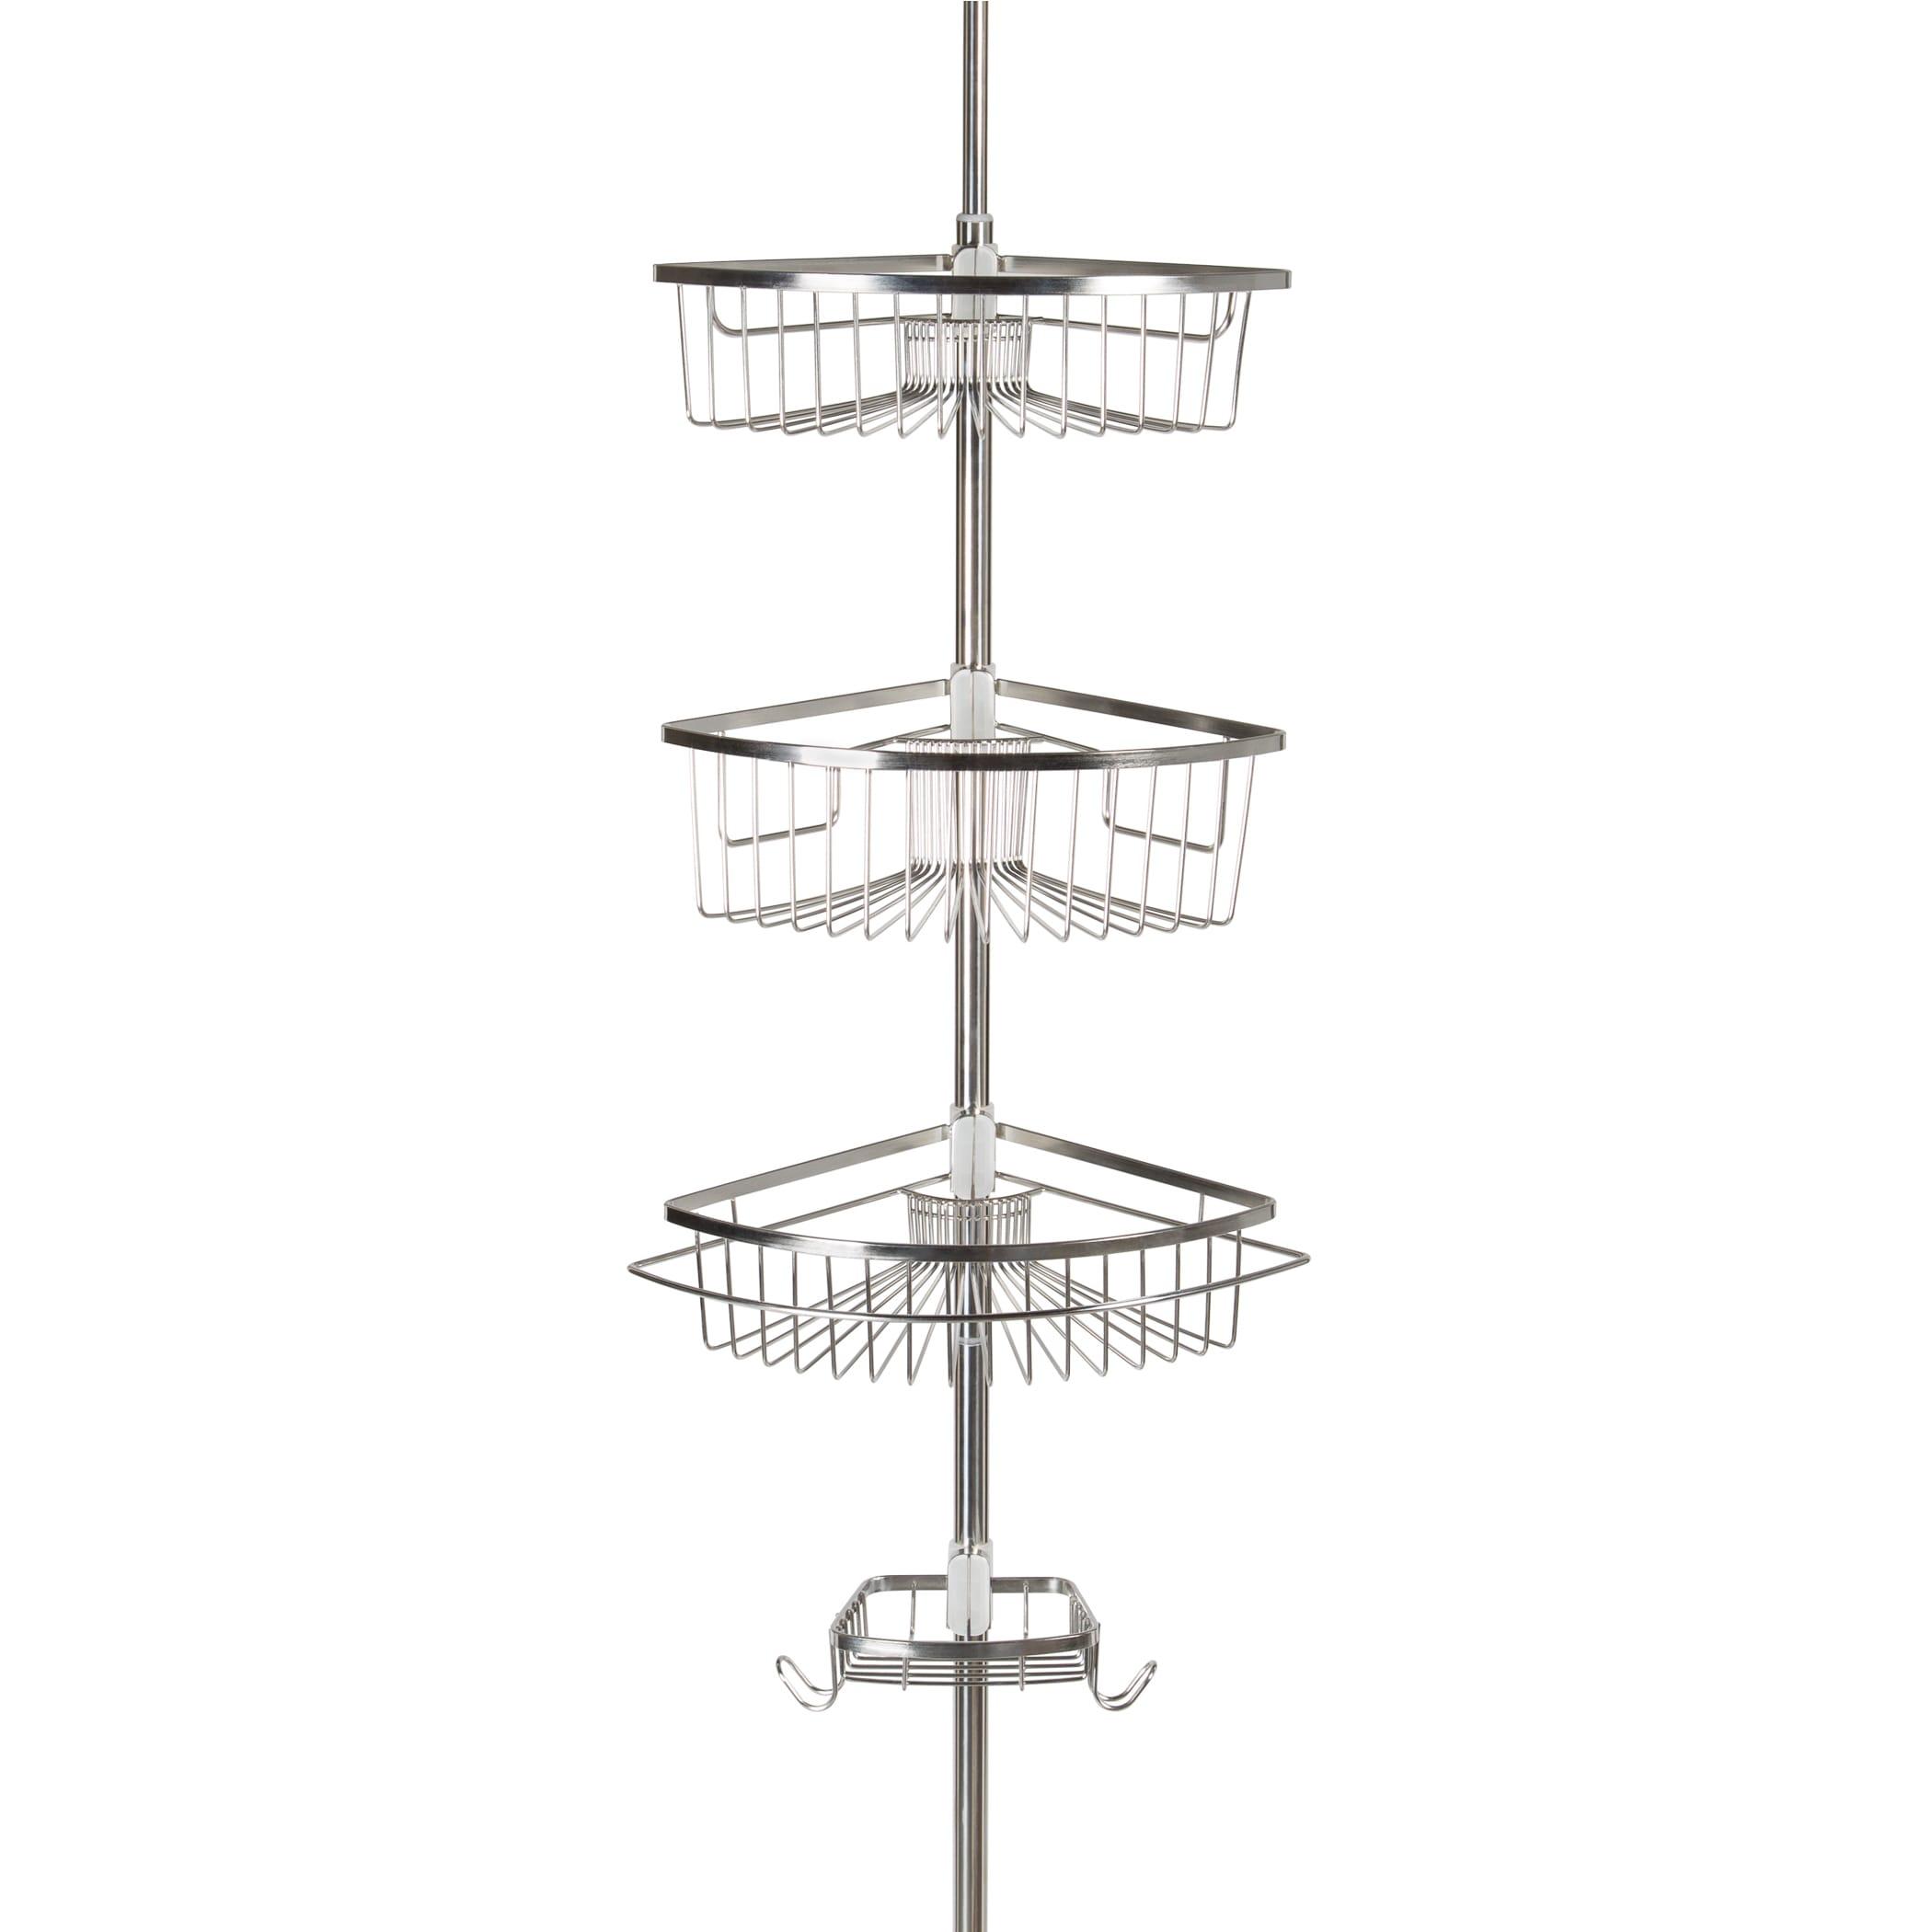 Unique Shower Organiser Pole Images Bathroom And Shower